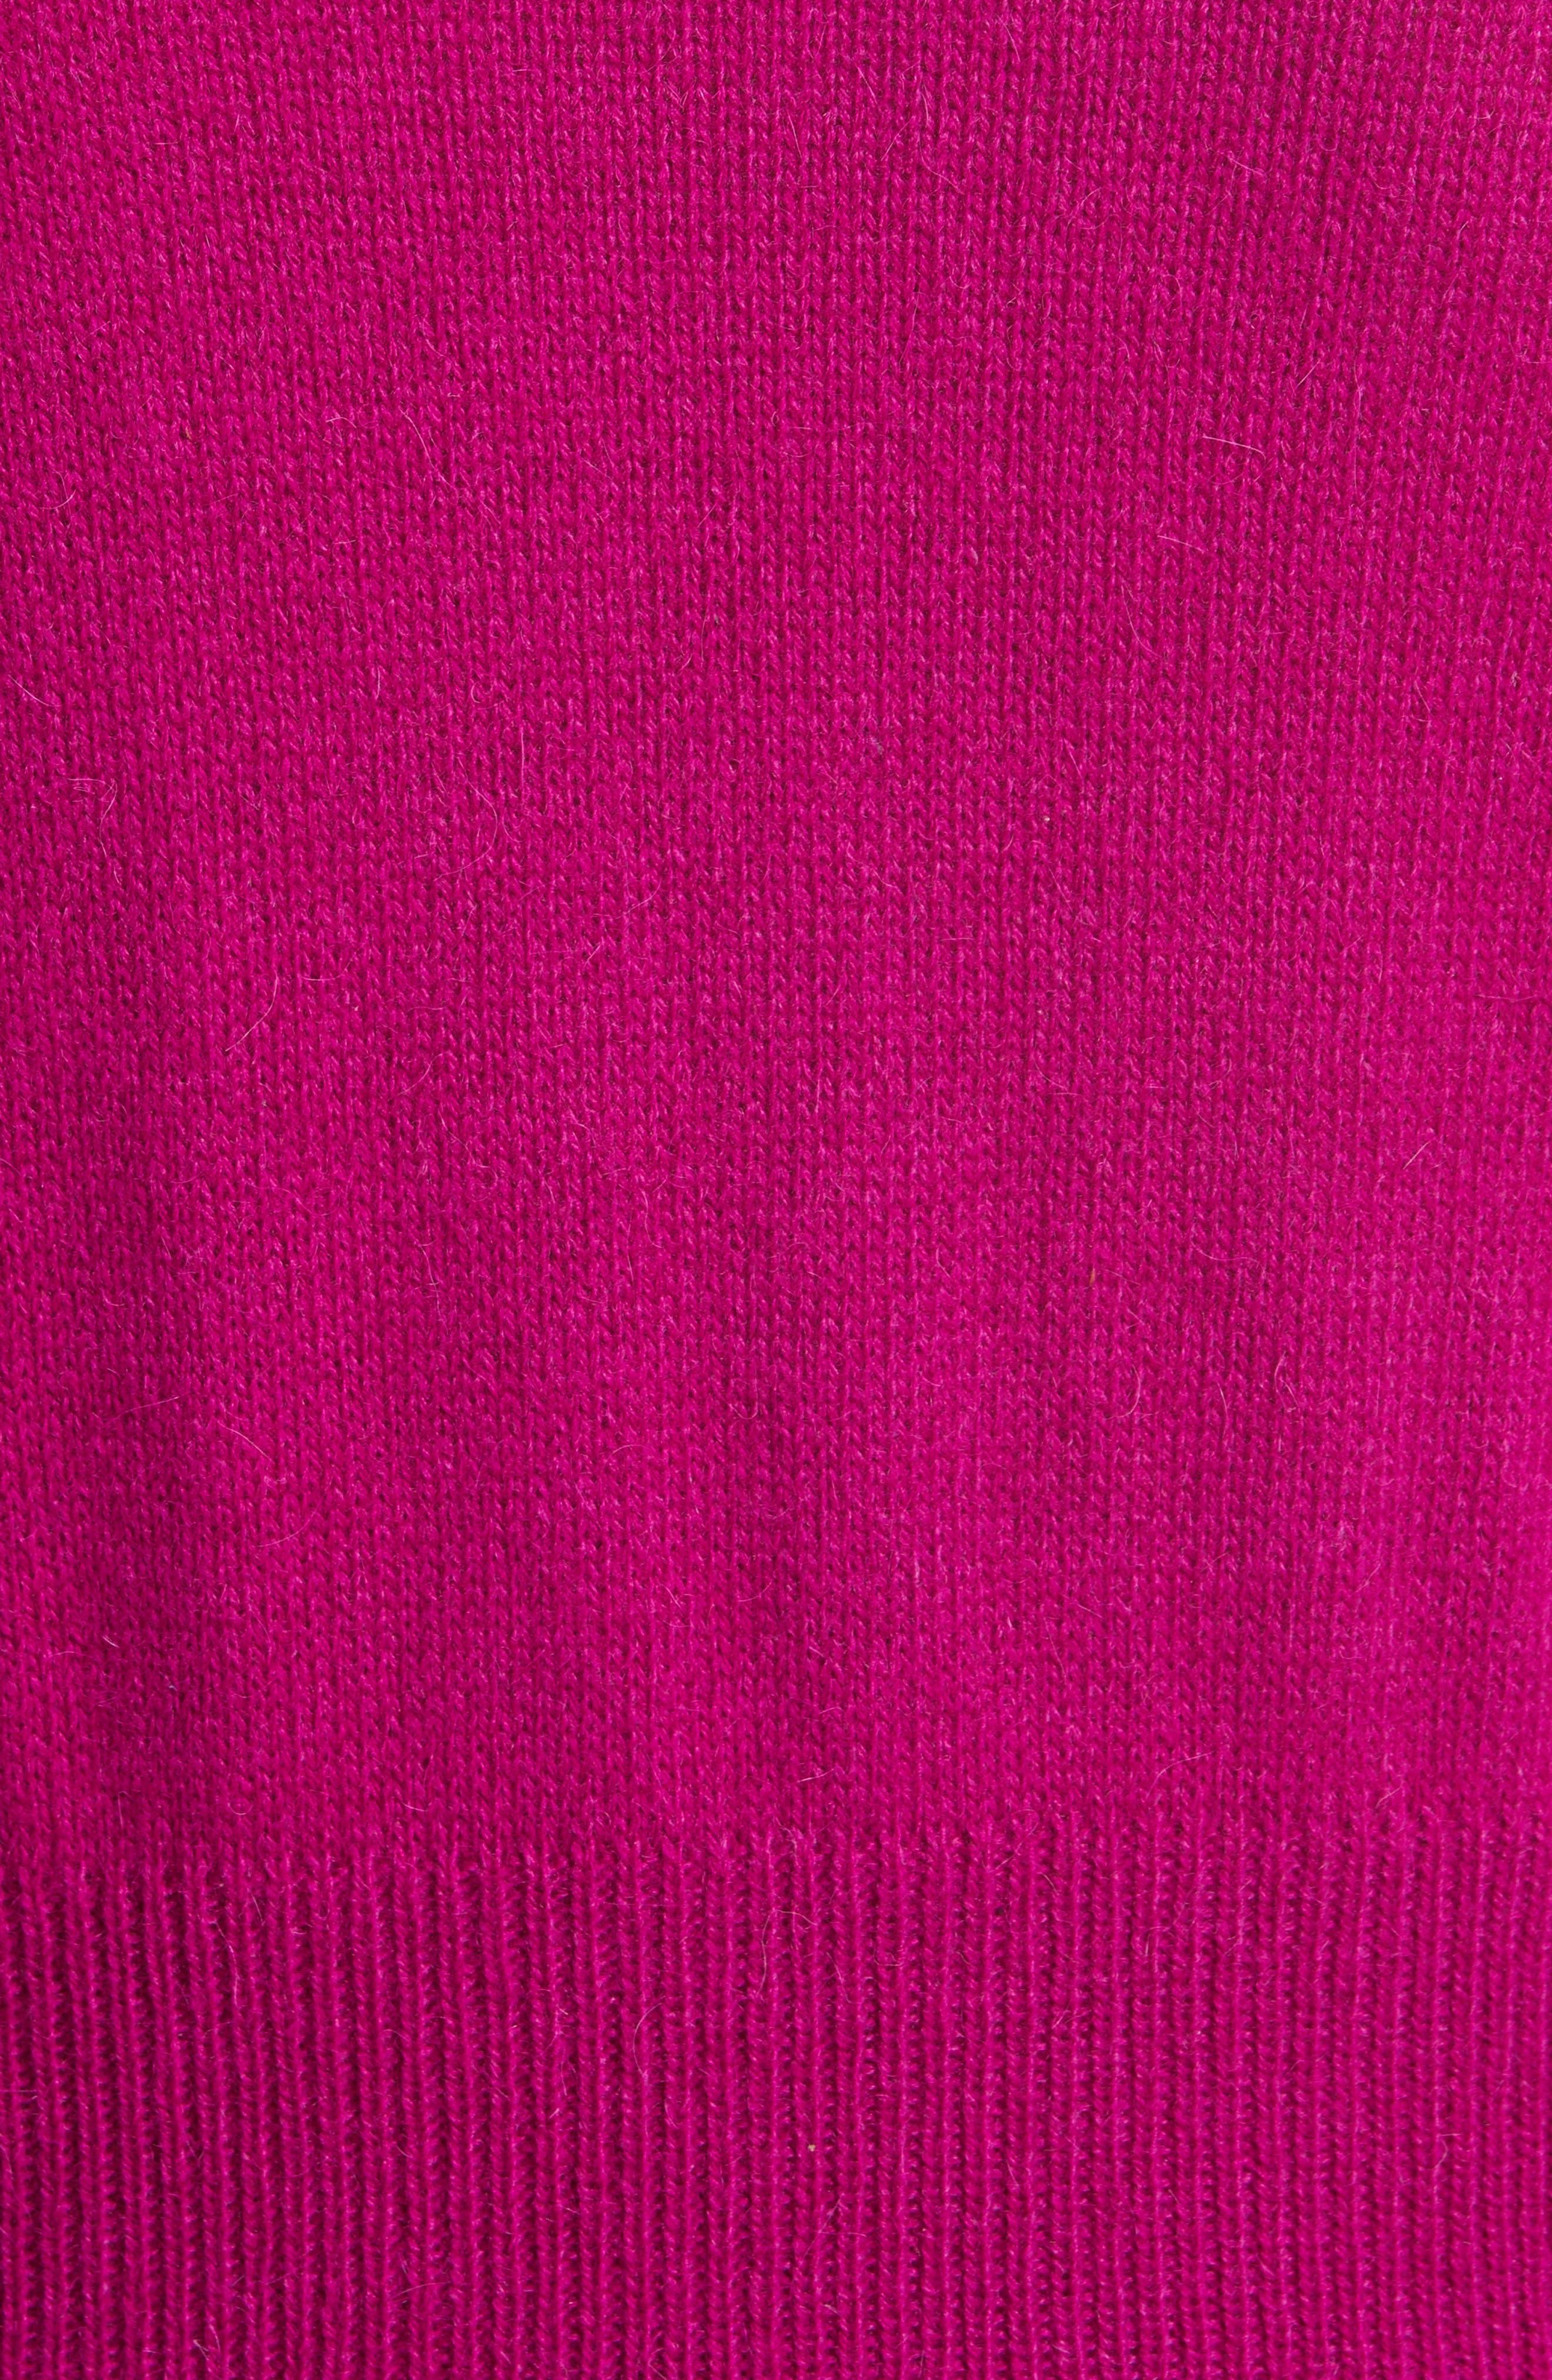 Flare Cuff Alpaca Blend Sweater,                             Alternate thumbnail 6, color,                             Magenta